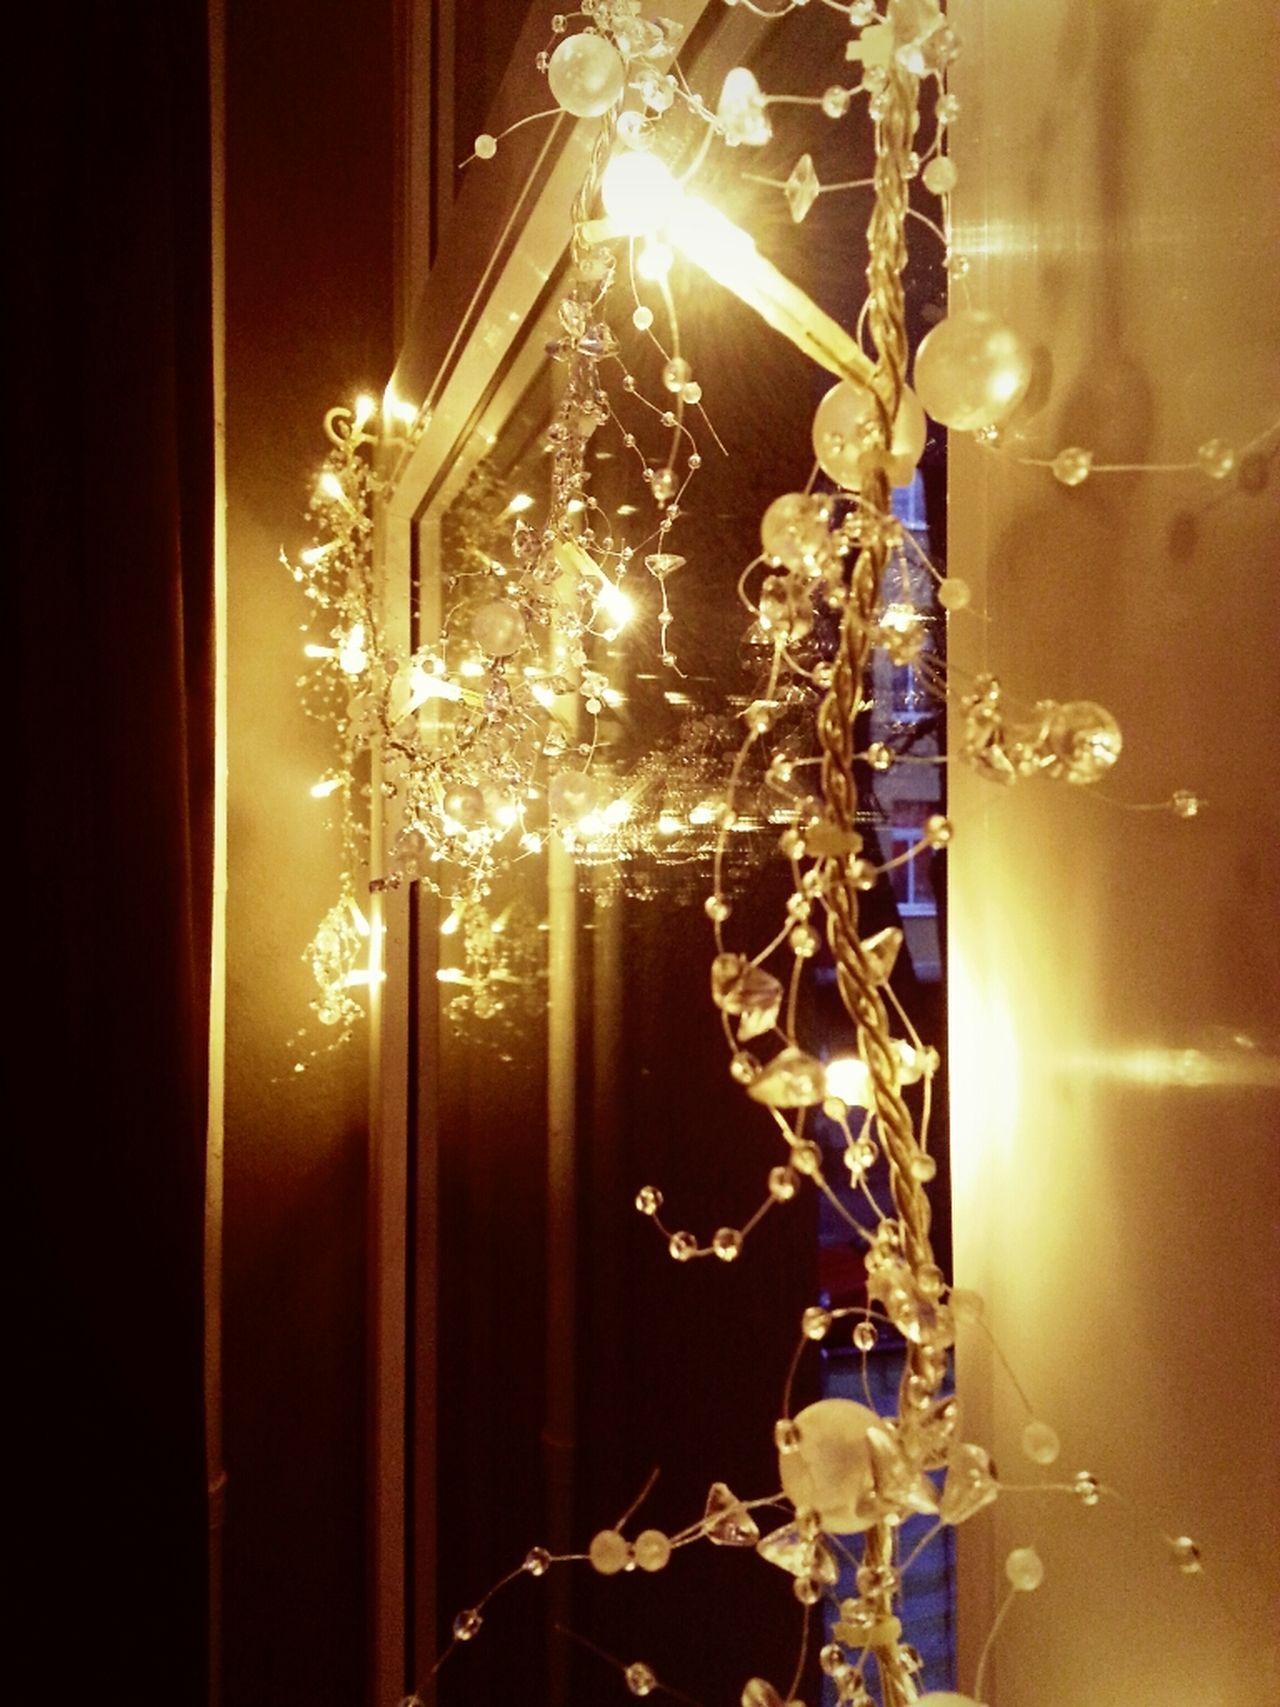 Christmas Christmas Lights Jingle Bells Presents Santa Claus Weinachten Weinachtslicht Weinachtsman